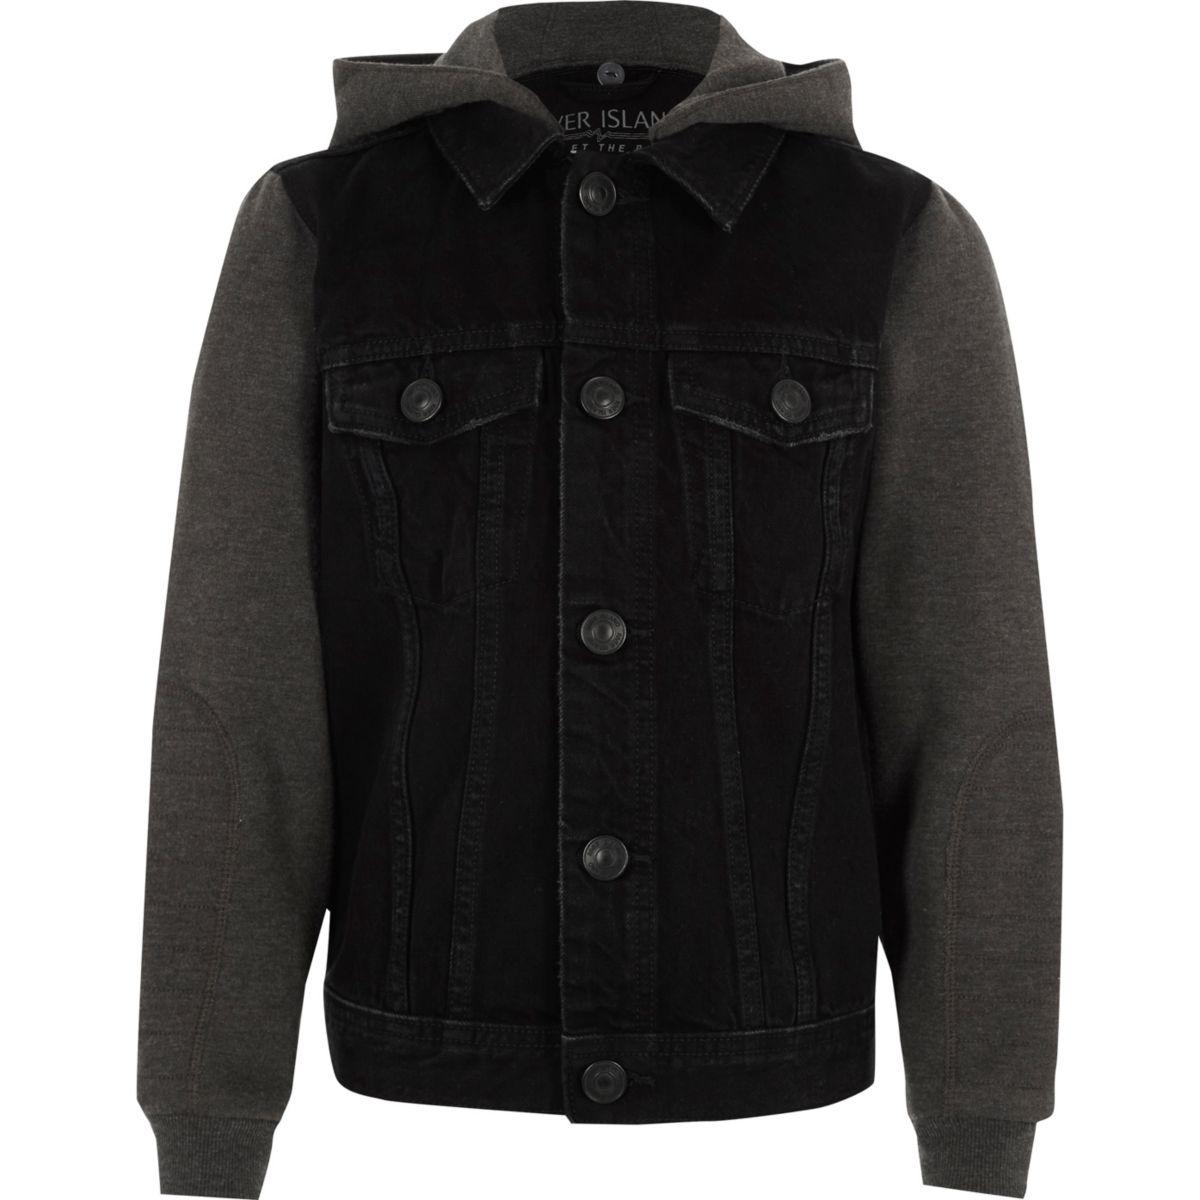 Boys black jersey sleeve hooded denim jacket